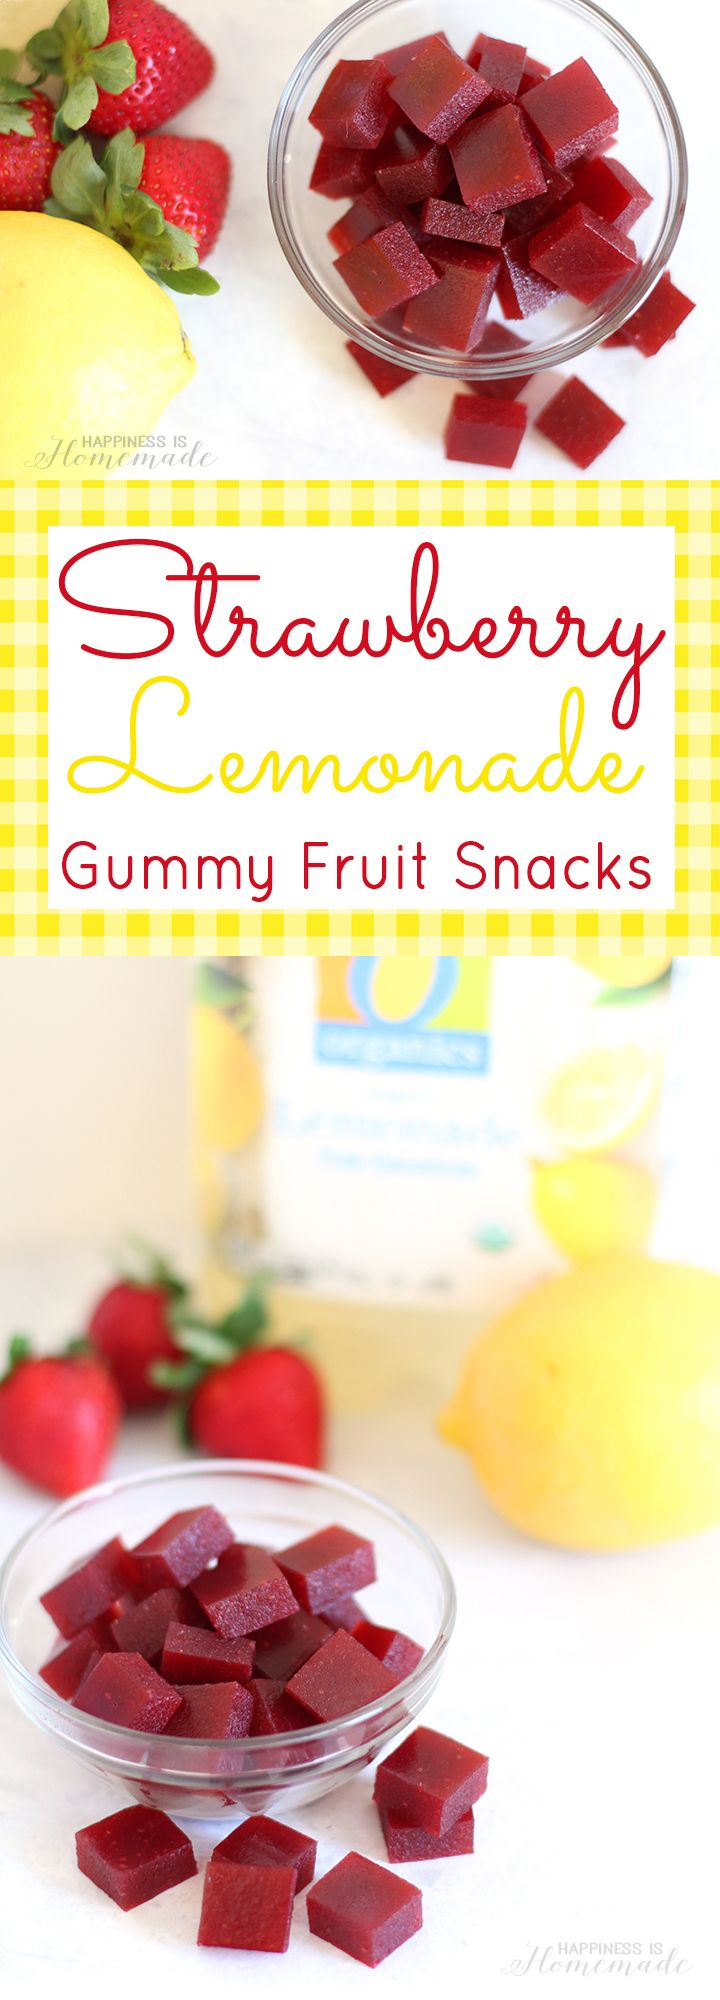 Homemade Organic Strawberry Lemonade Gummy Fruit Snacks Recipe                                                                                                                                                                                 More